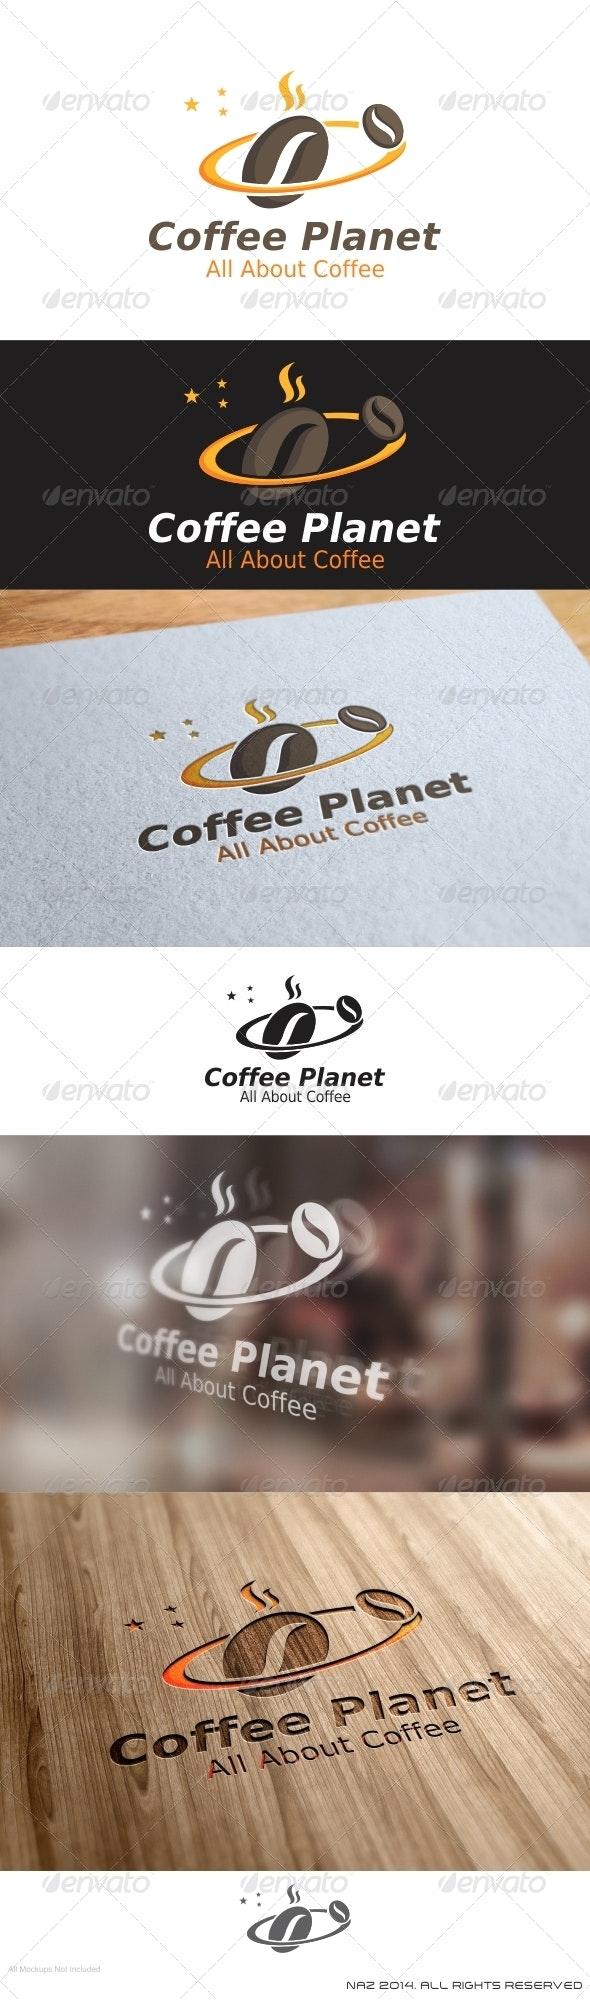 Coffee Planet Logo - Objects Logo Templates